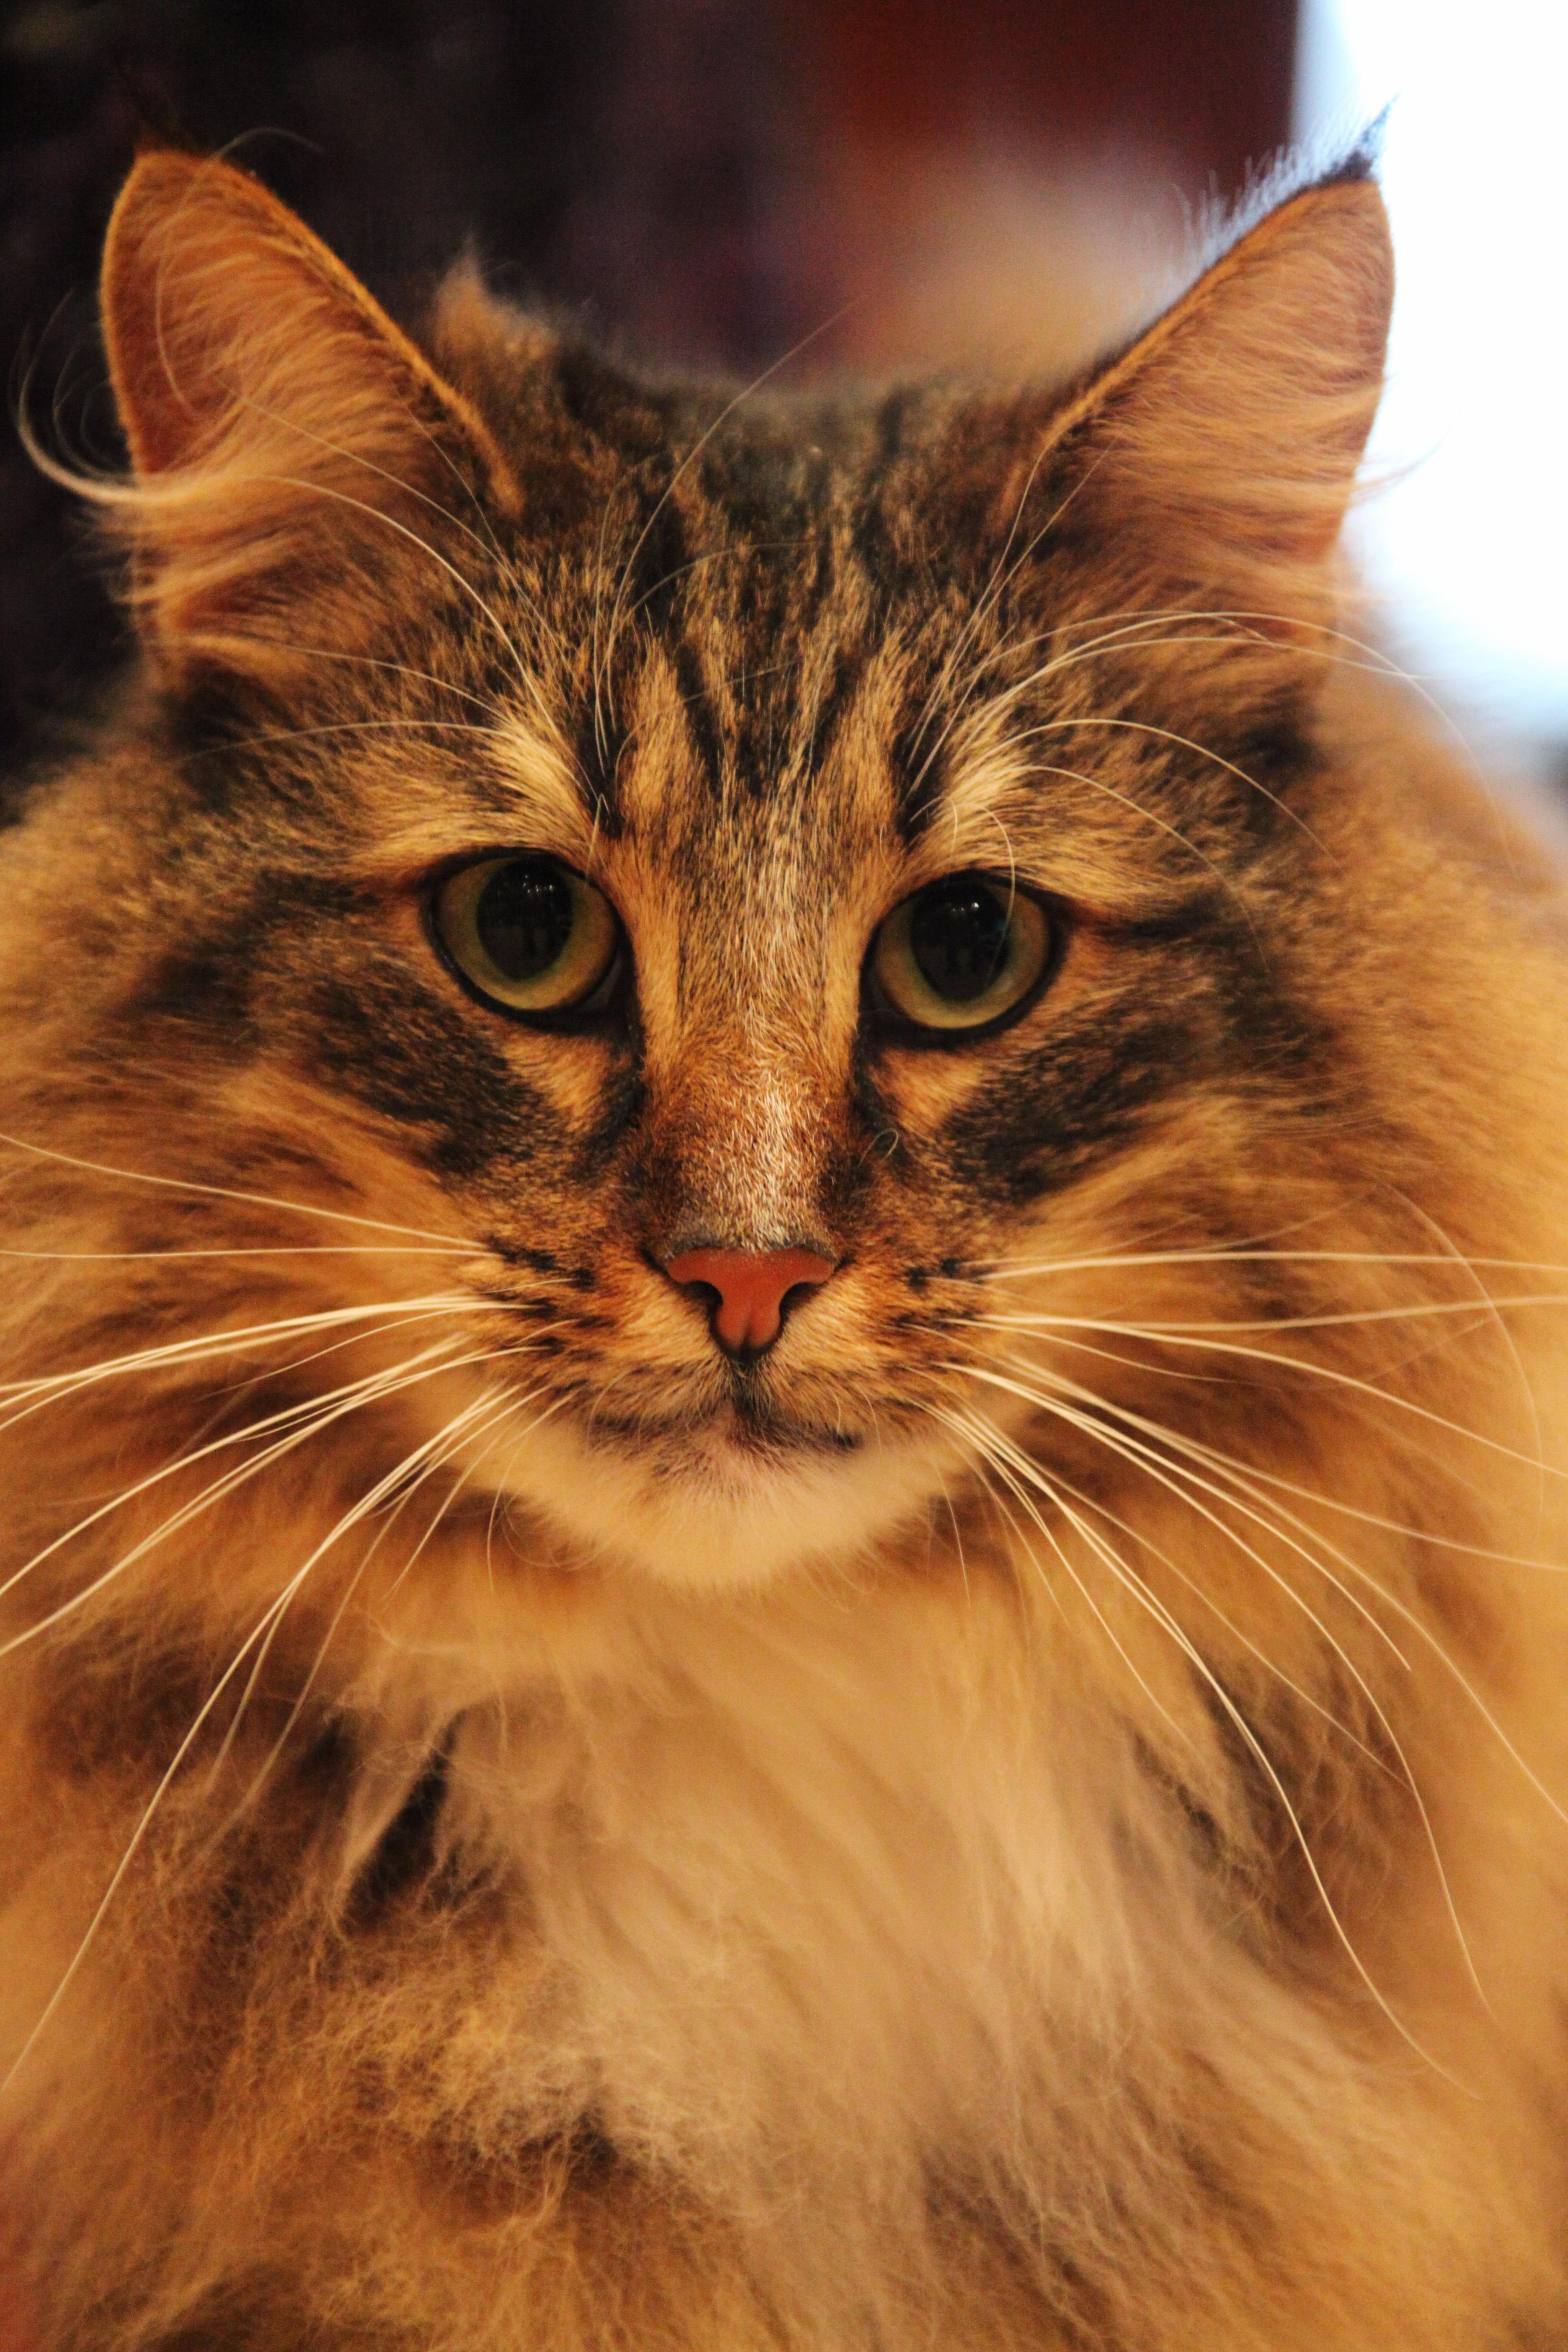 File:Norwegian Forest Cat face.jpg - Wikimedia Commons Tabby Norwegian Forest Cat